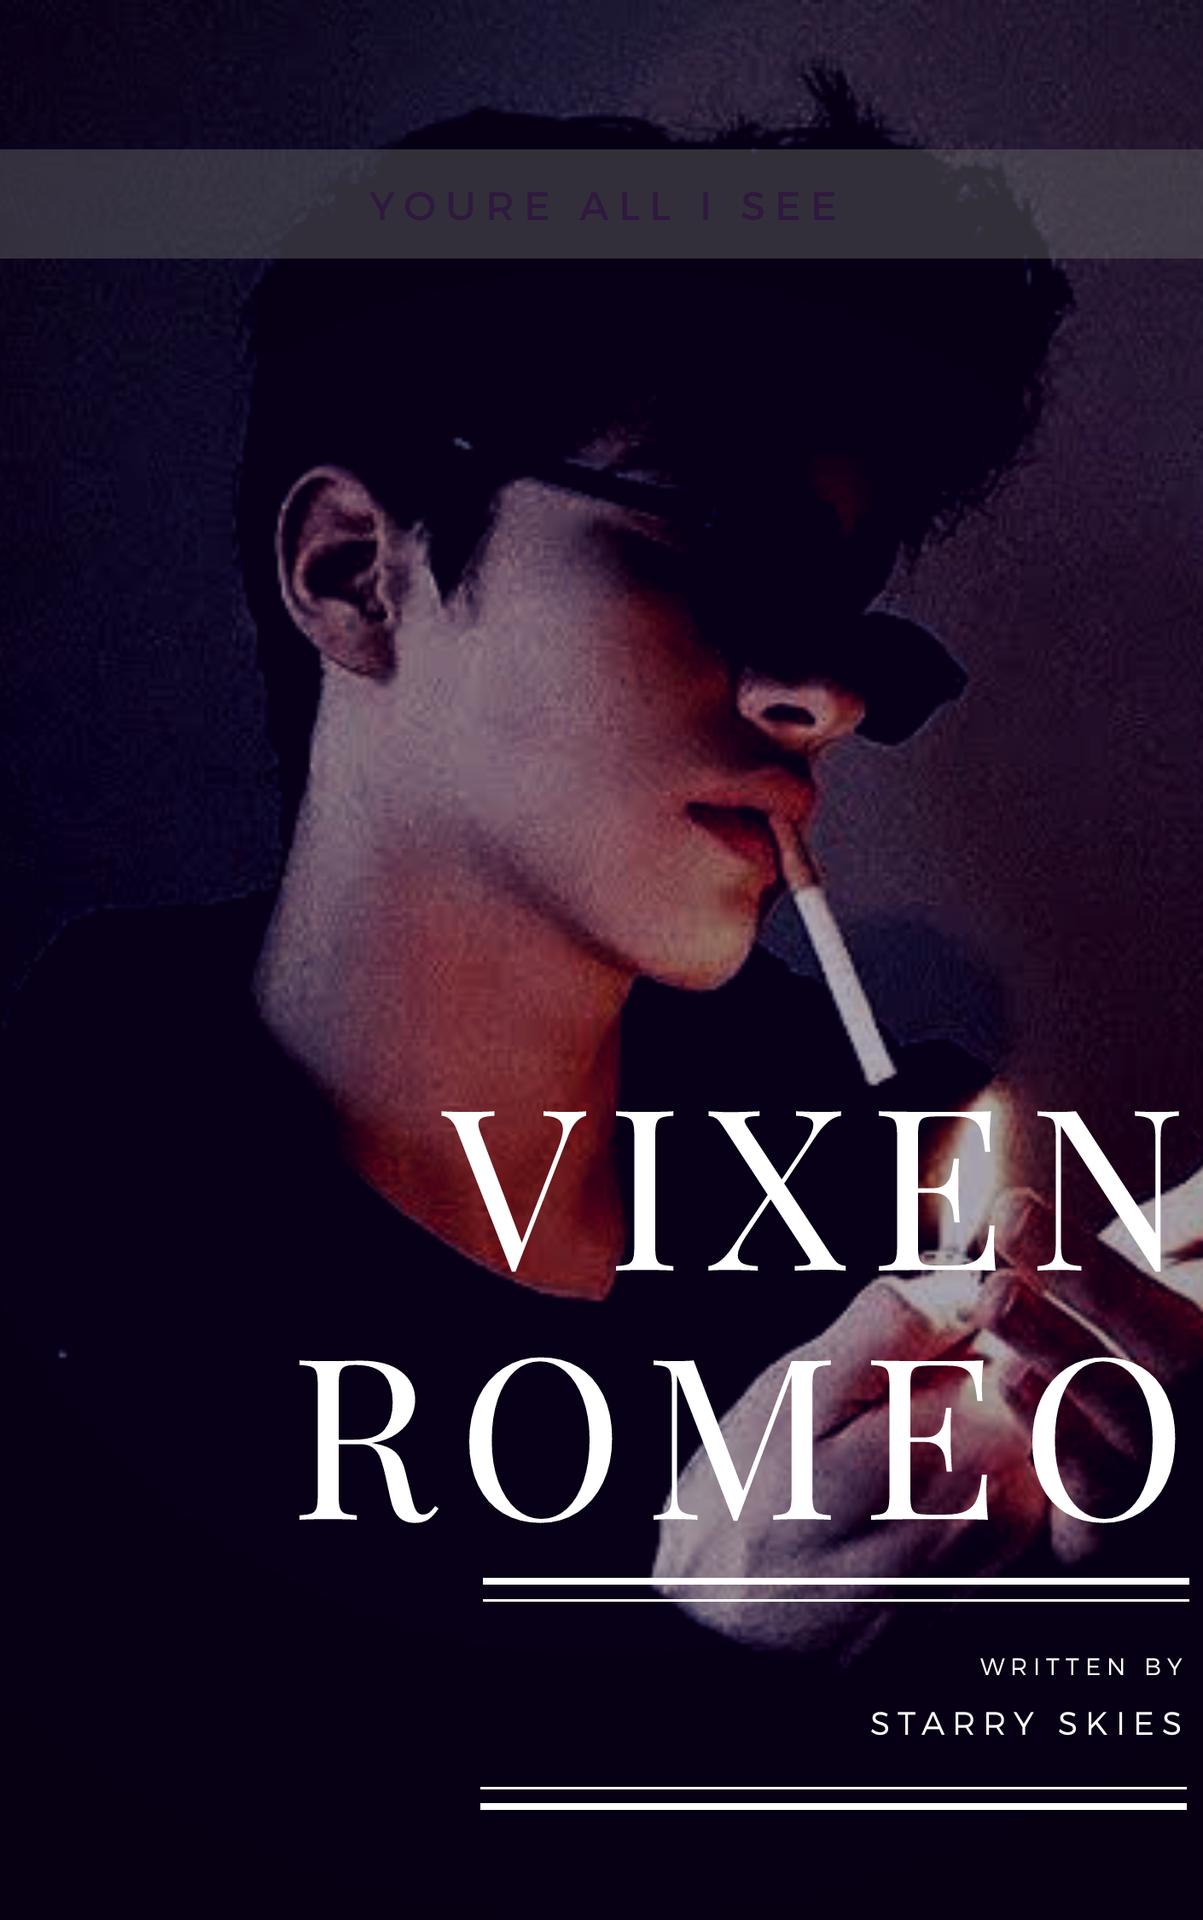 Watch Vixen Romeo video